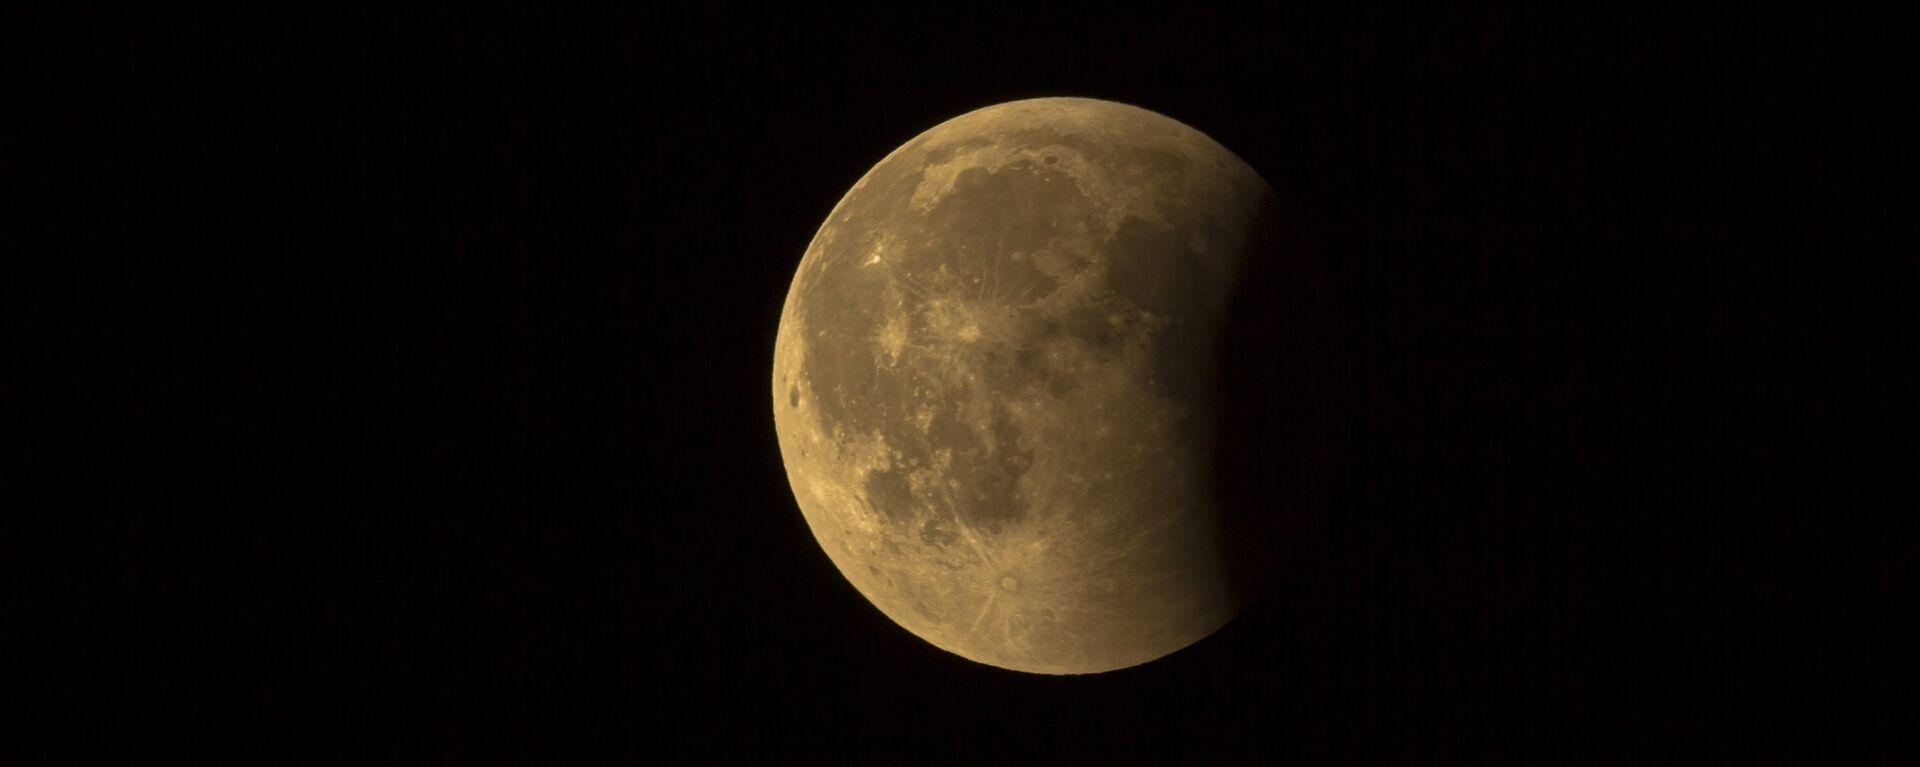 Луна - Sputnik Грузия, 1920, 03.03.2021